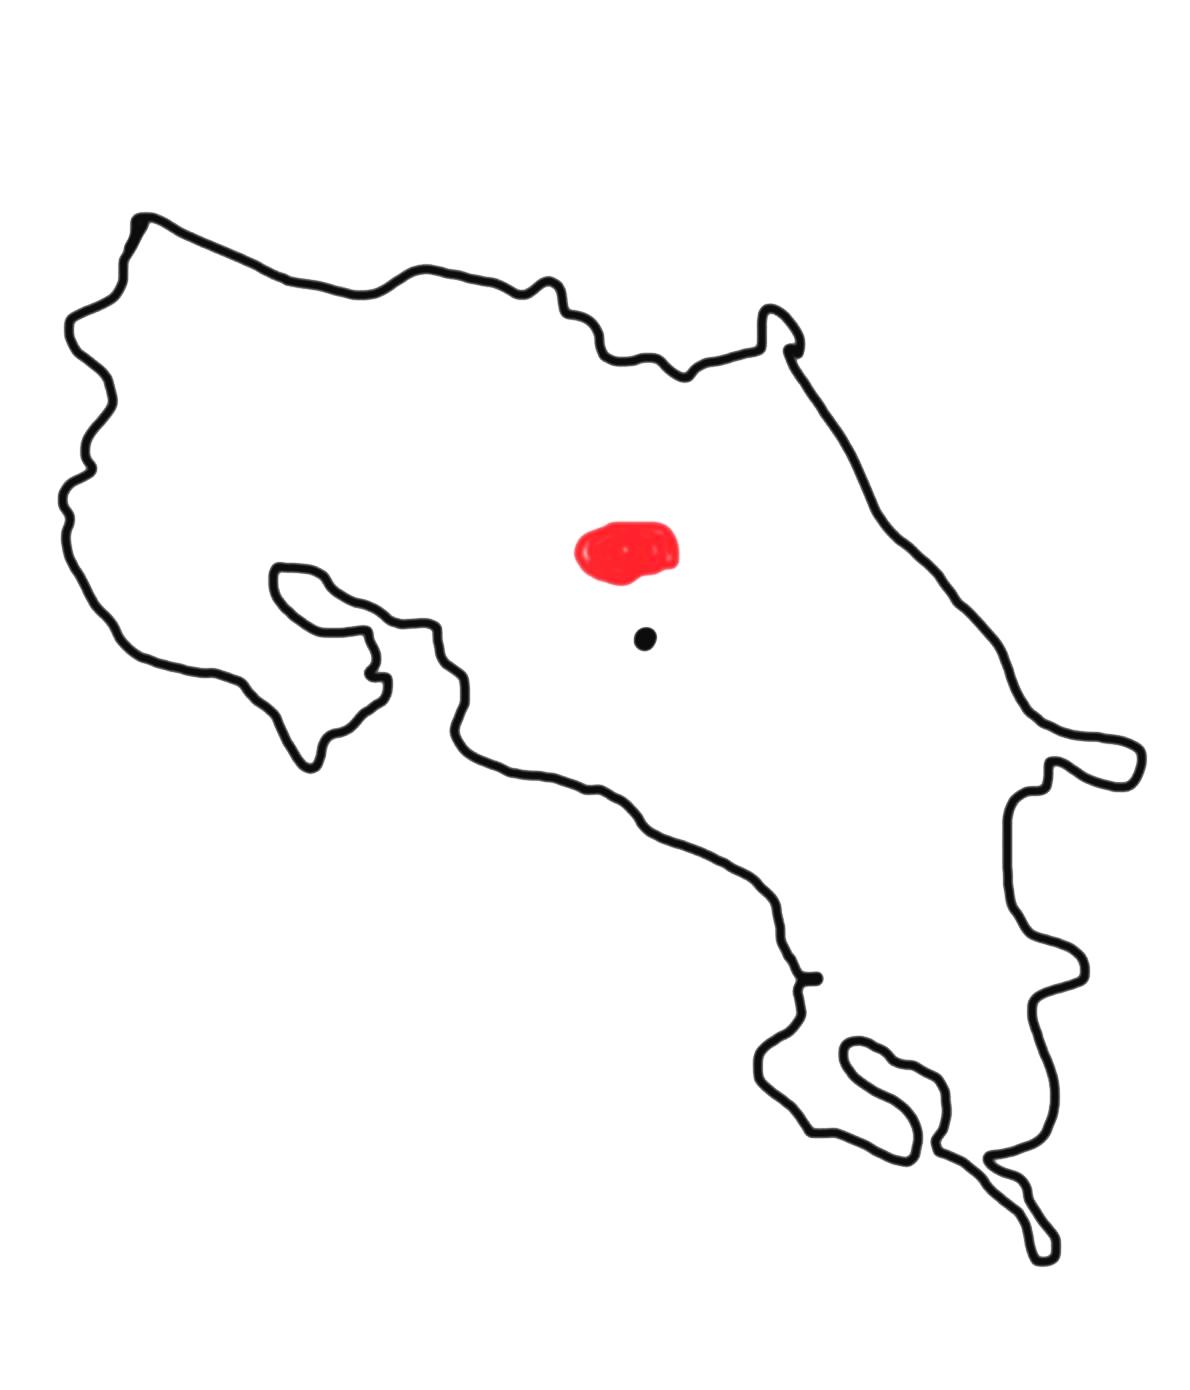 Central Valley - close to Alajuela (San Jose)